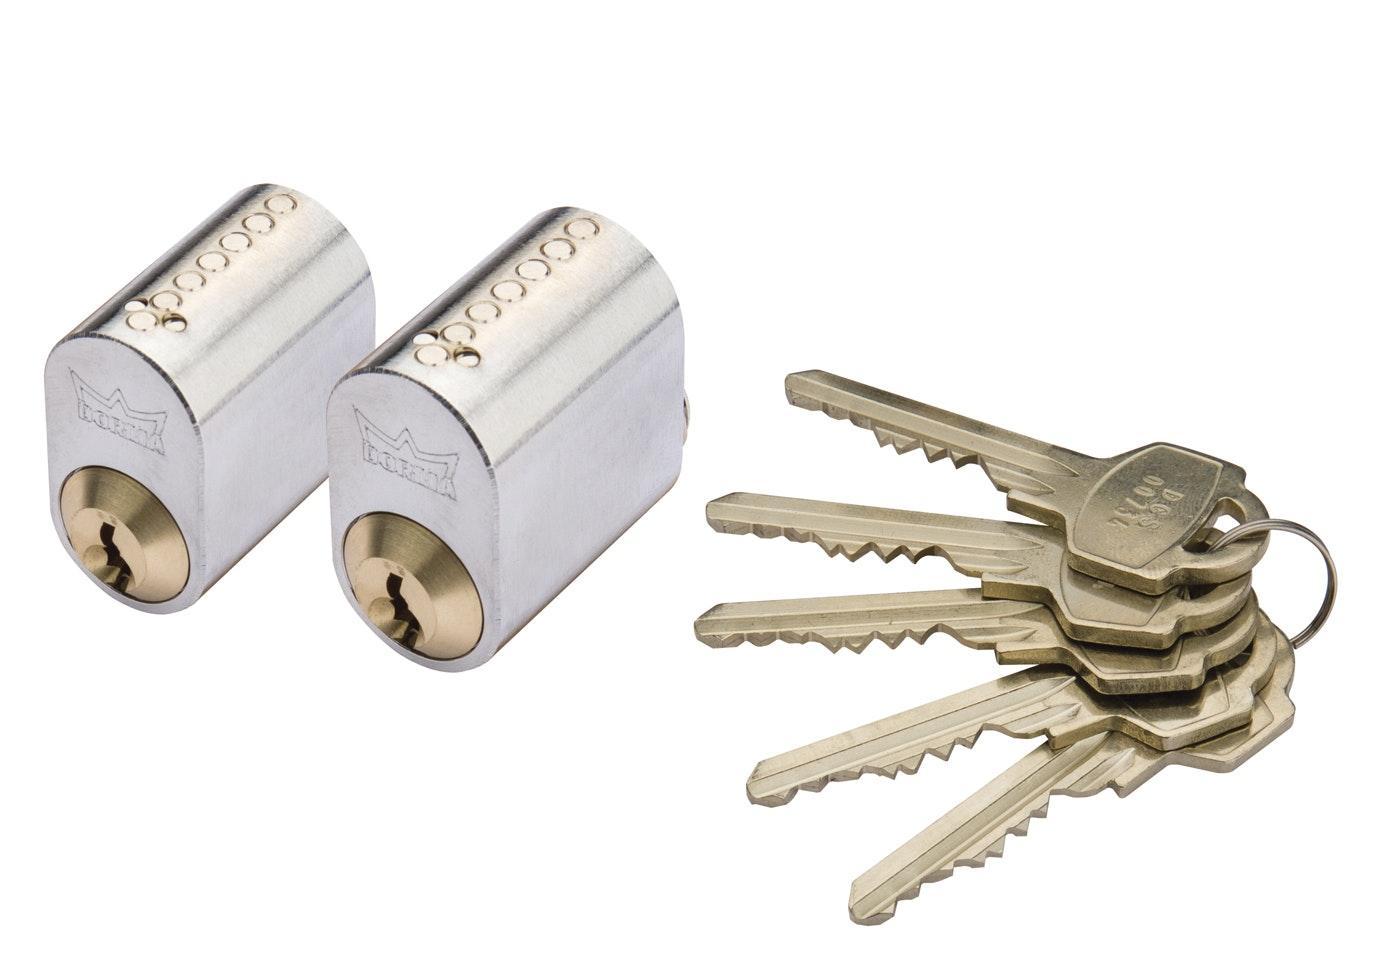 Cylinder Millers 7-Stift-Ll Krom 2-Pack Med 5 Nycklar